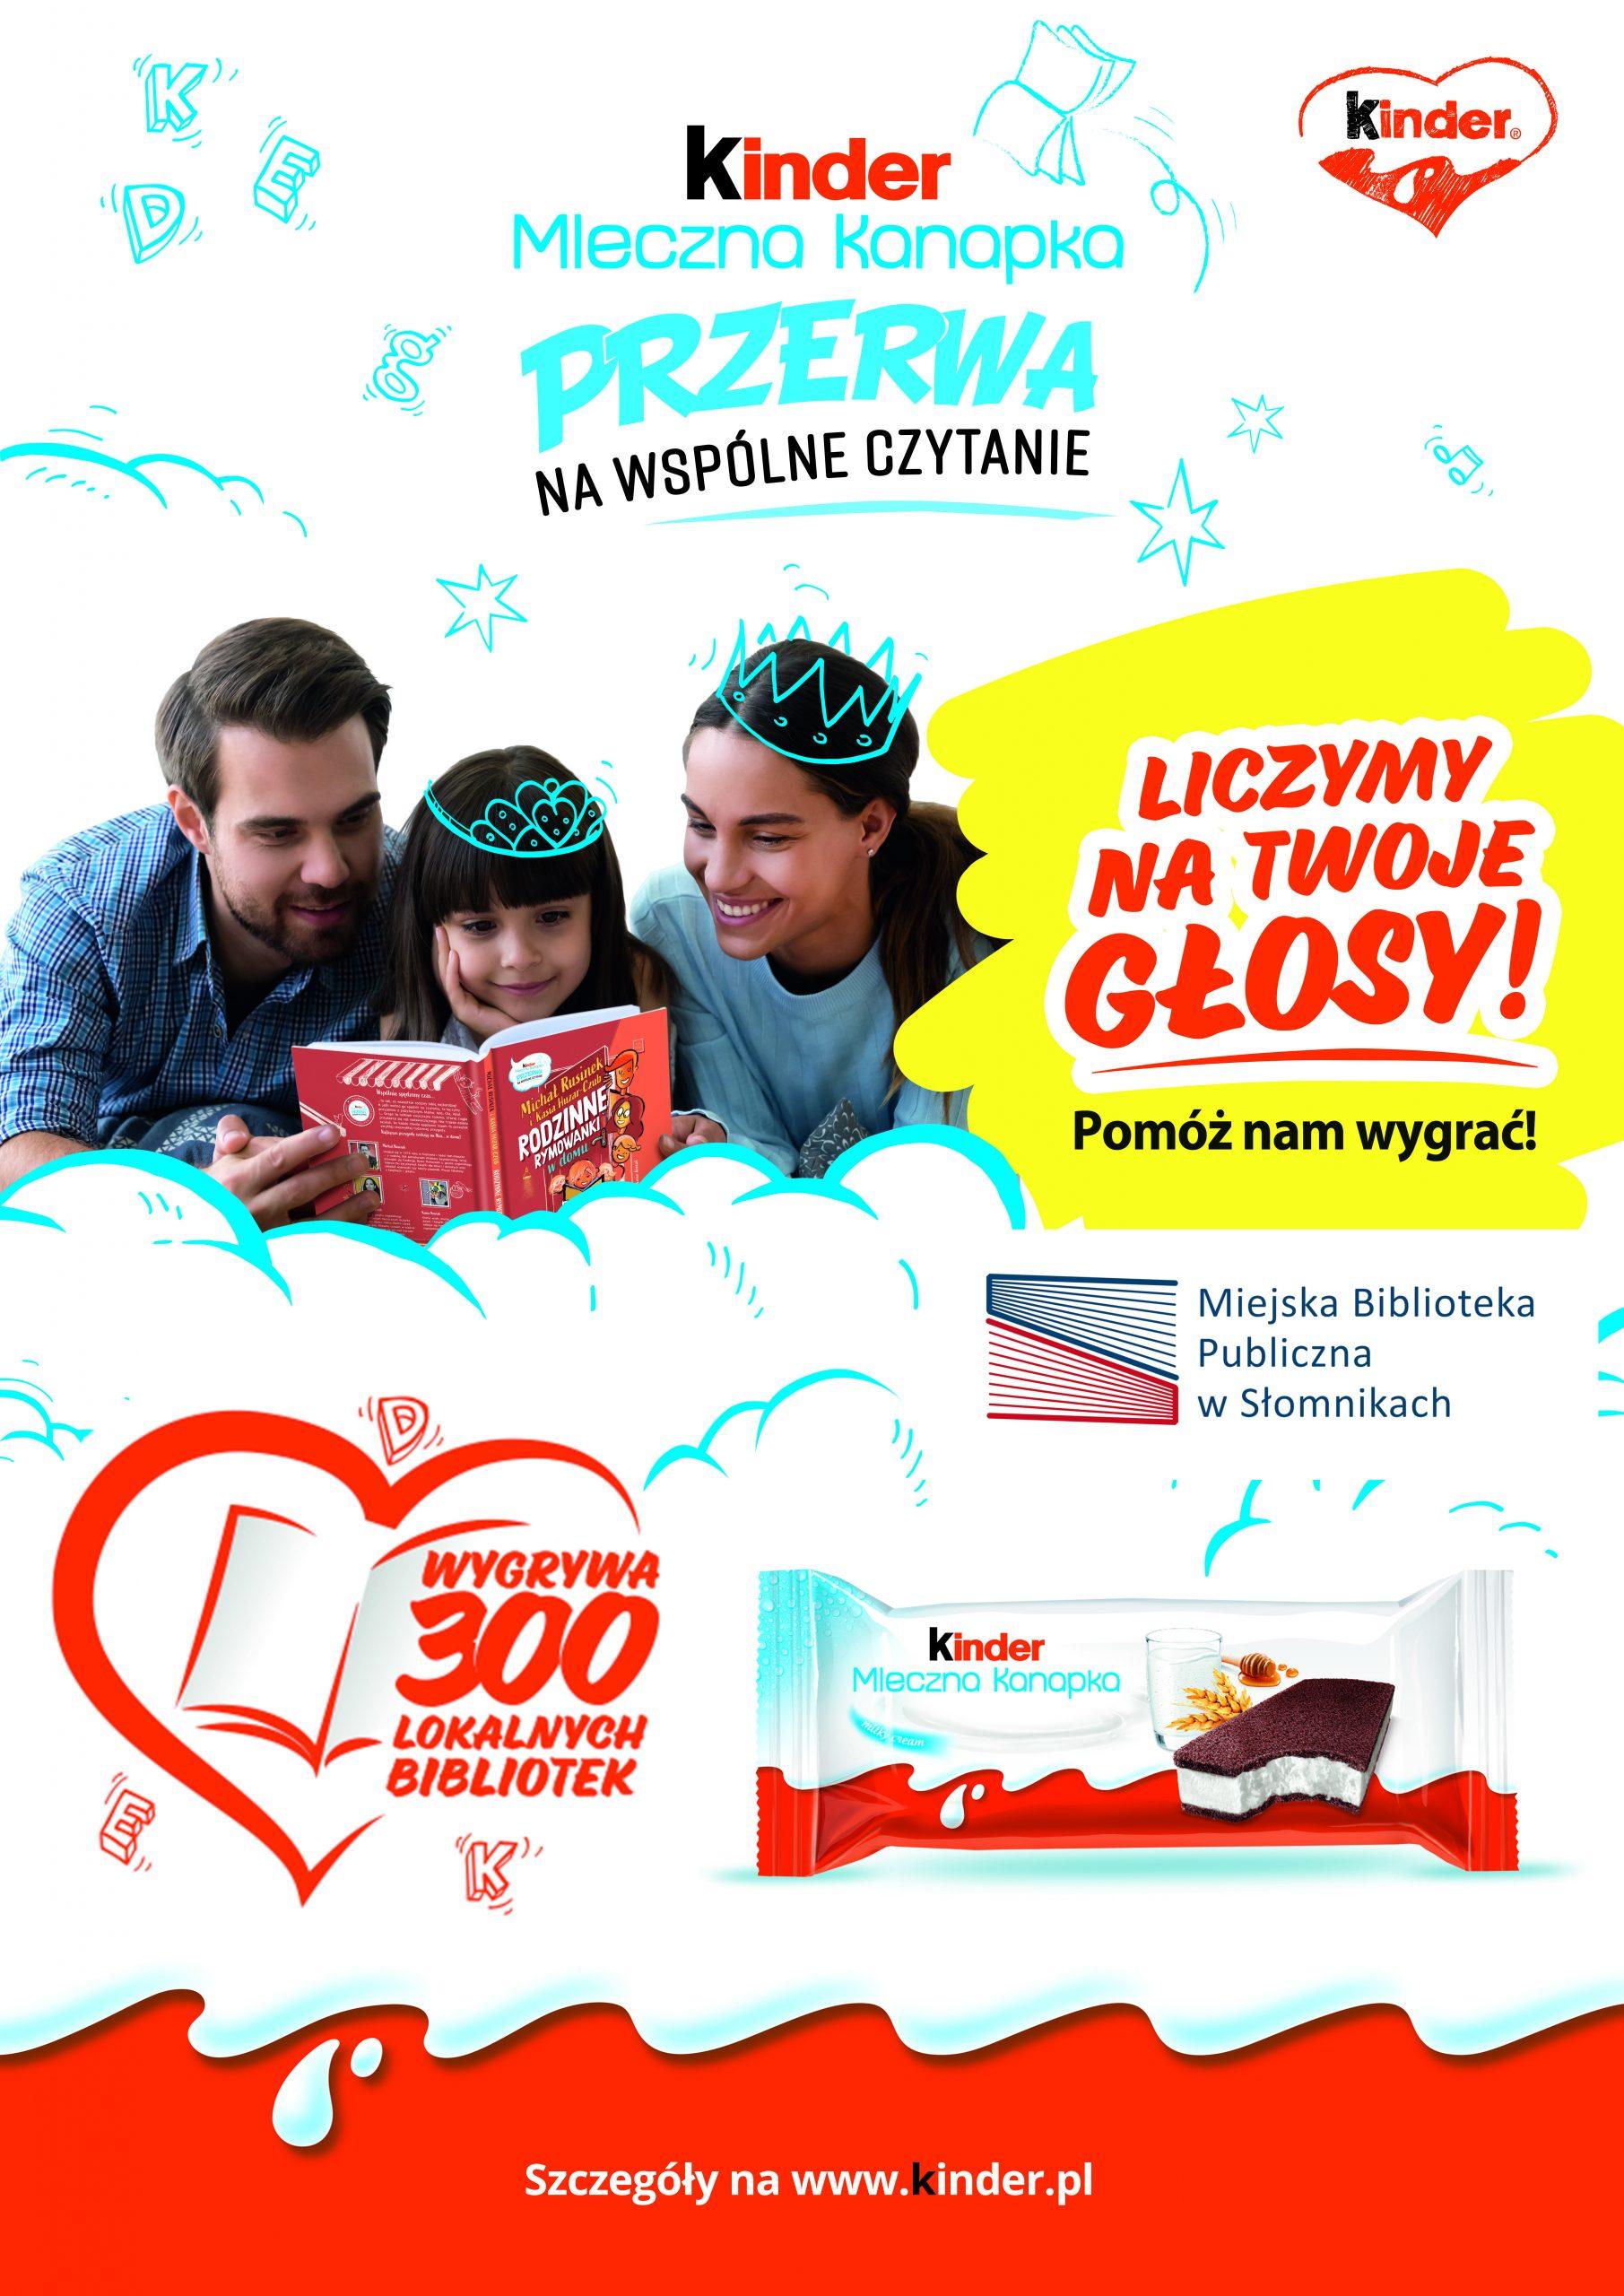 Kinder Słomniki